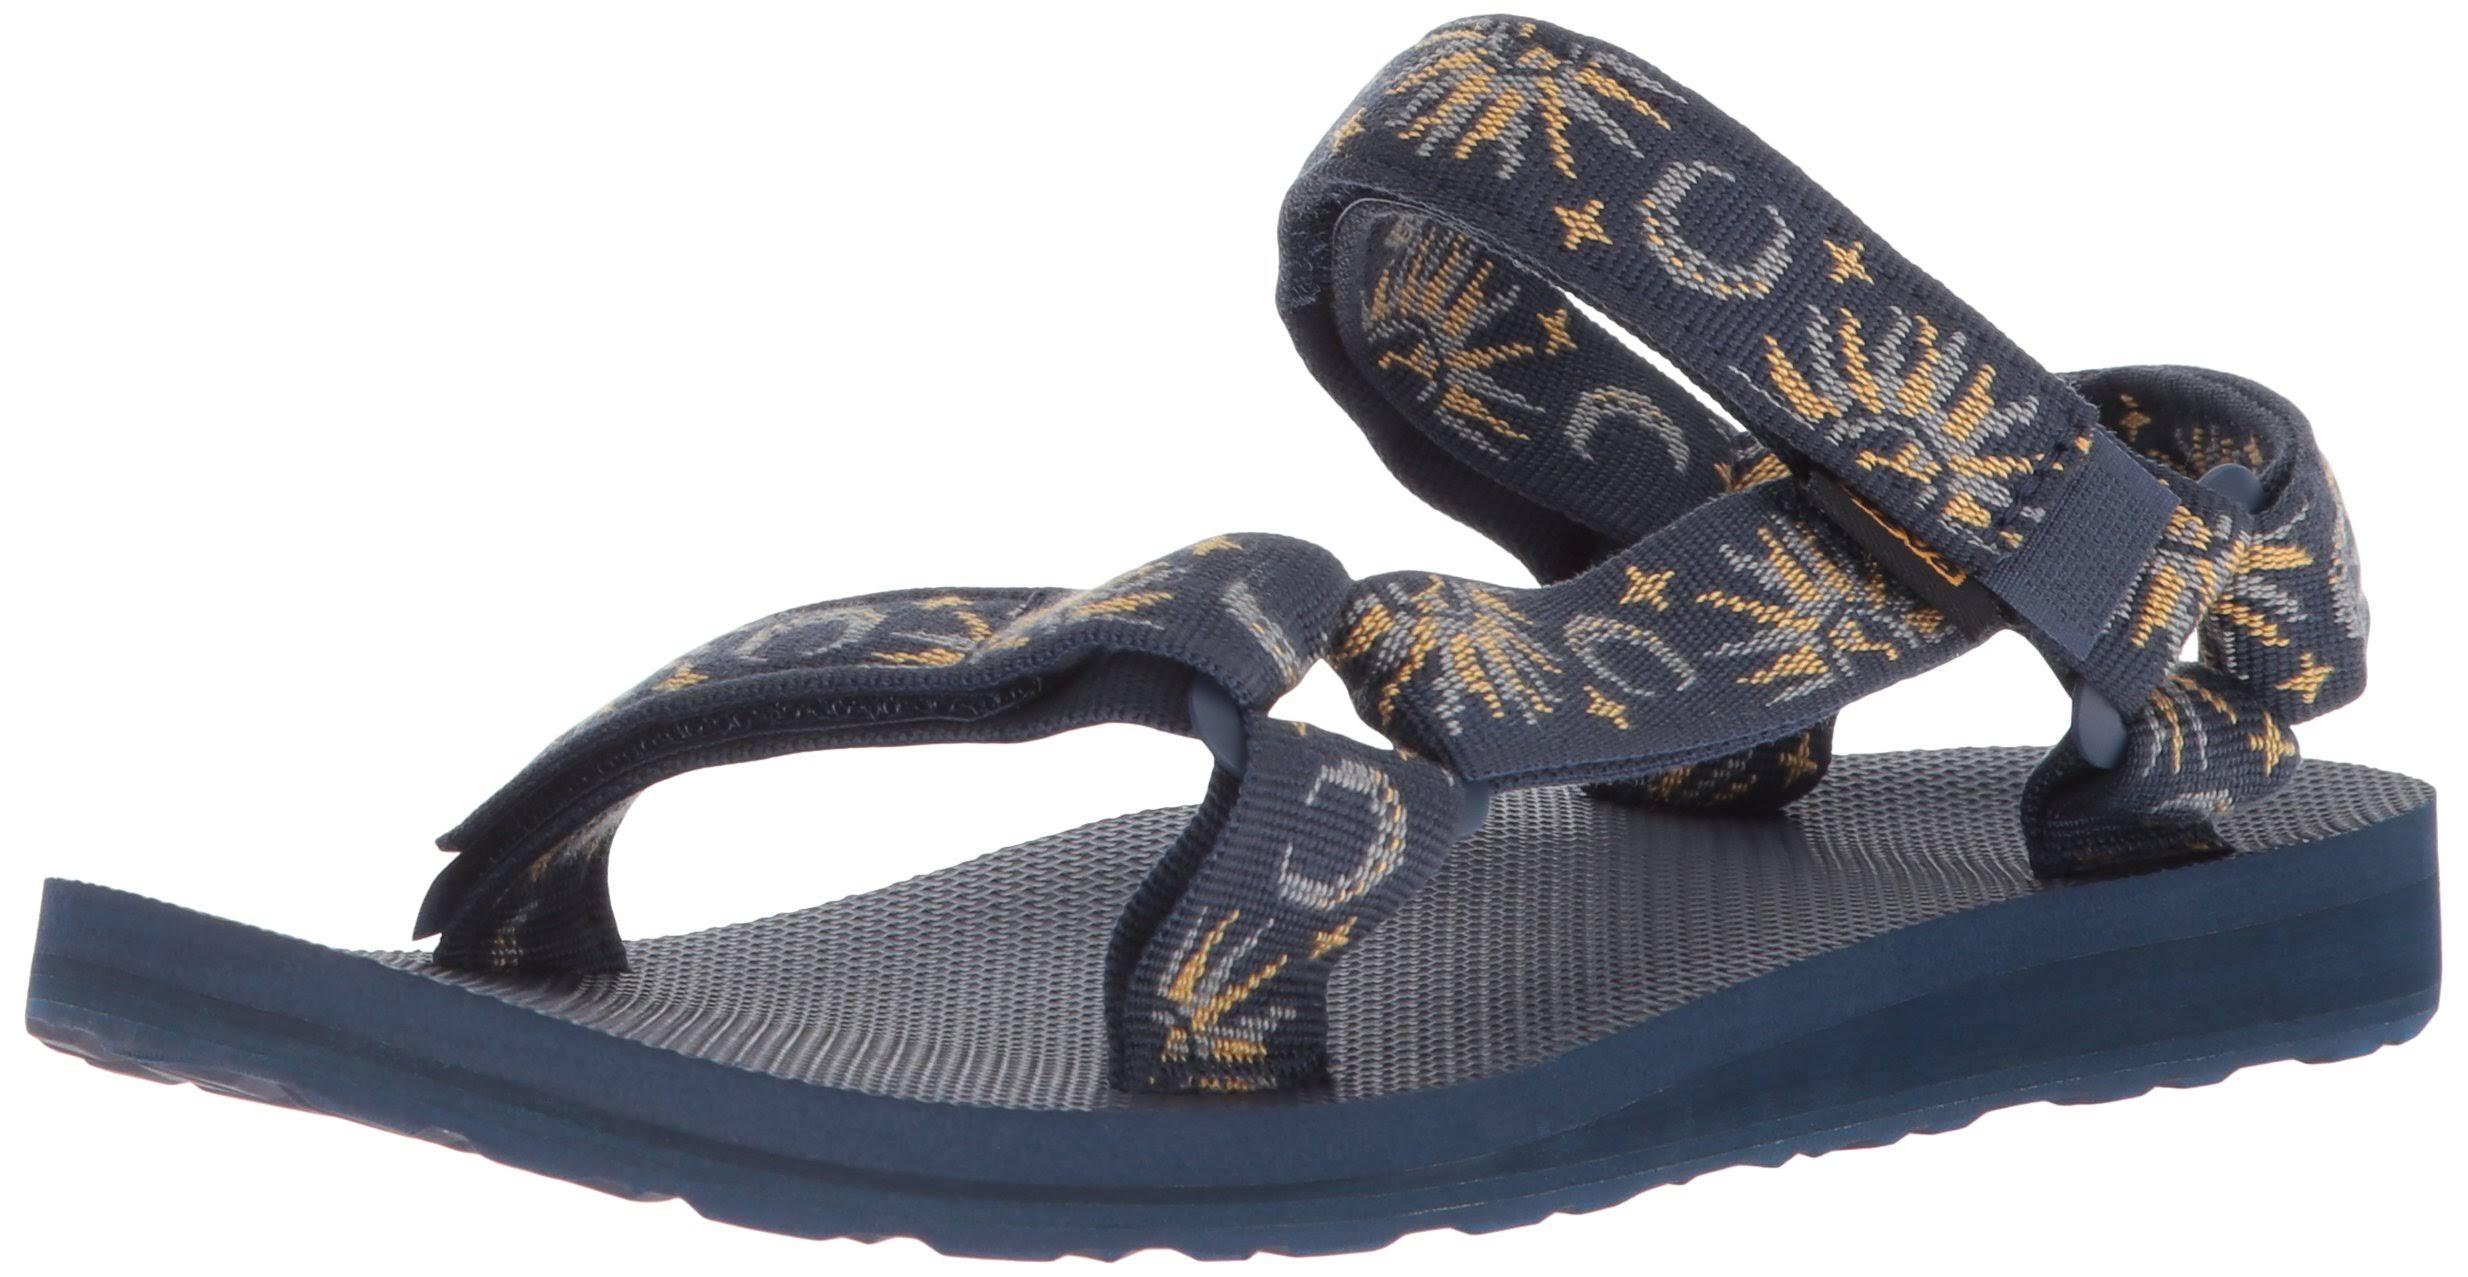 W Universal Sun Sandalo Insignia Womens Teva Moon Blue Original And Sportivo 8NXOkwPn0